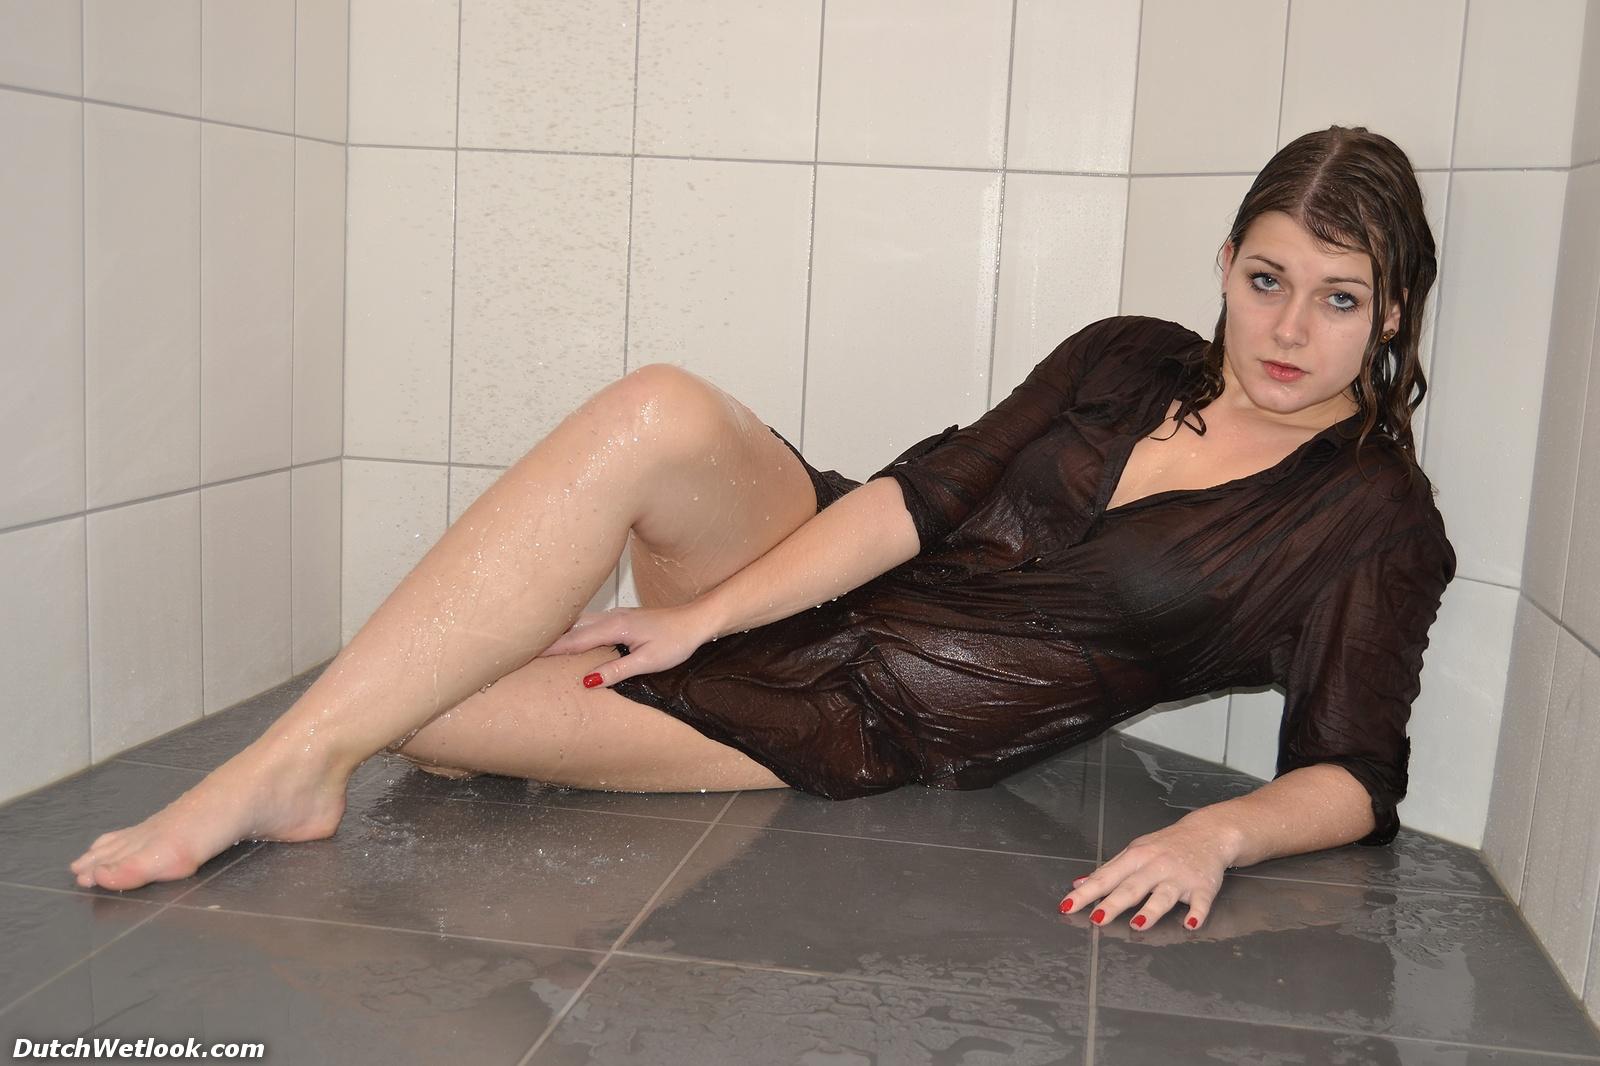 actrice porno clara morgan